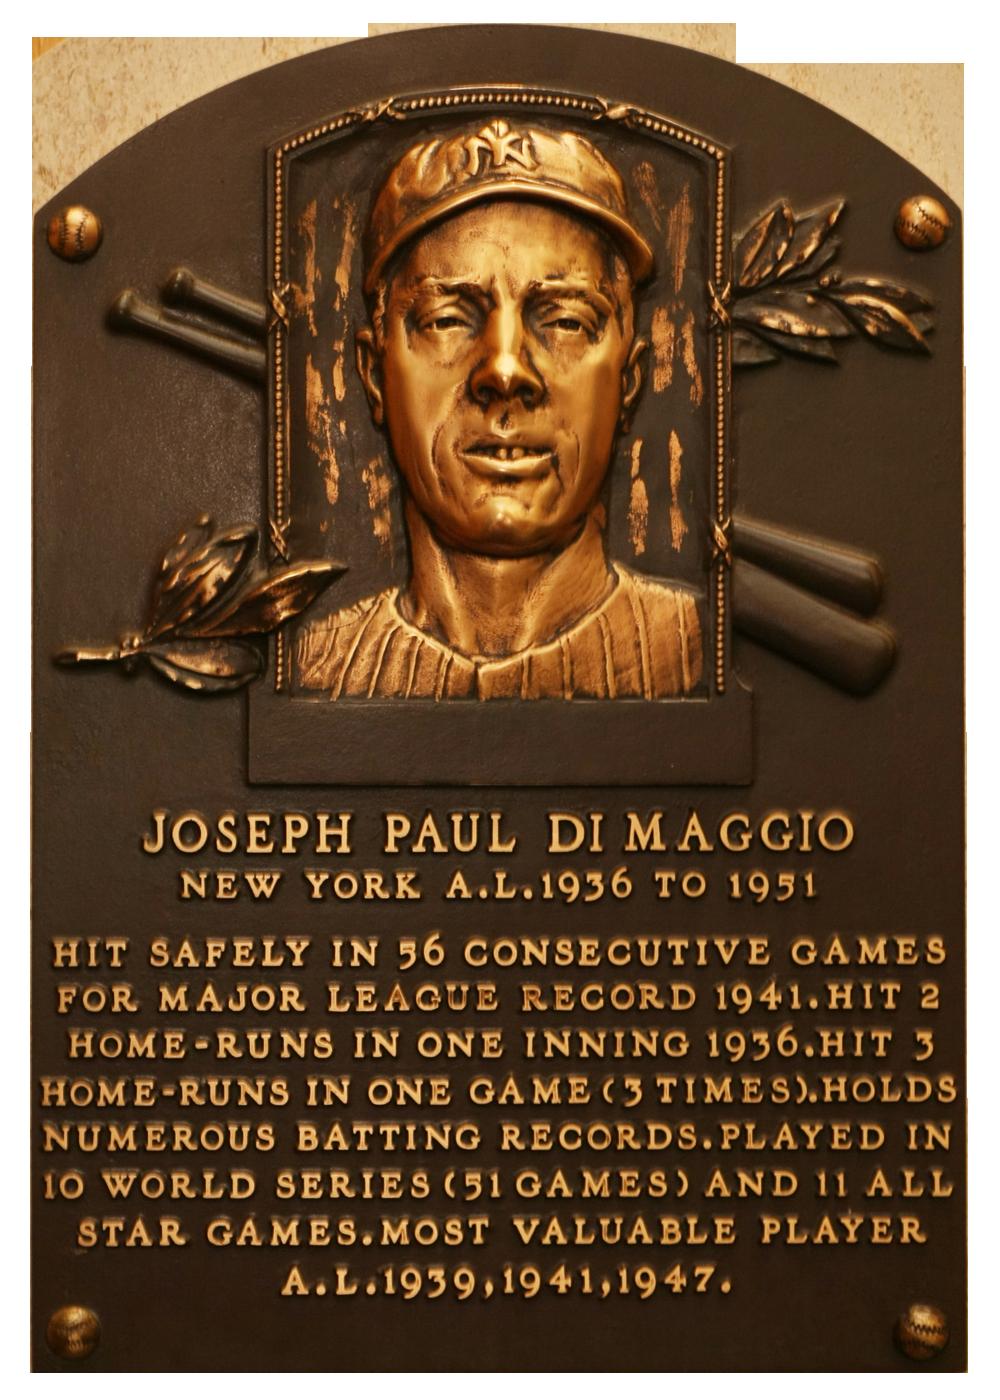 Image result for baseball's joe dimag g io born